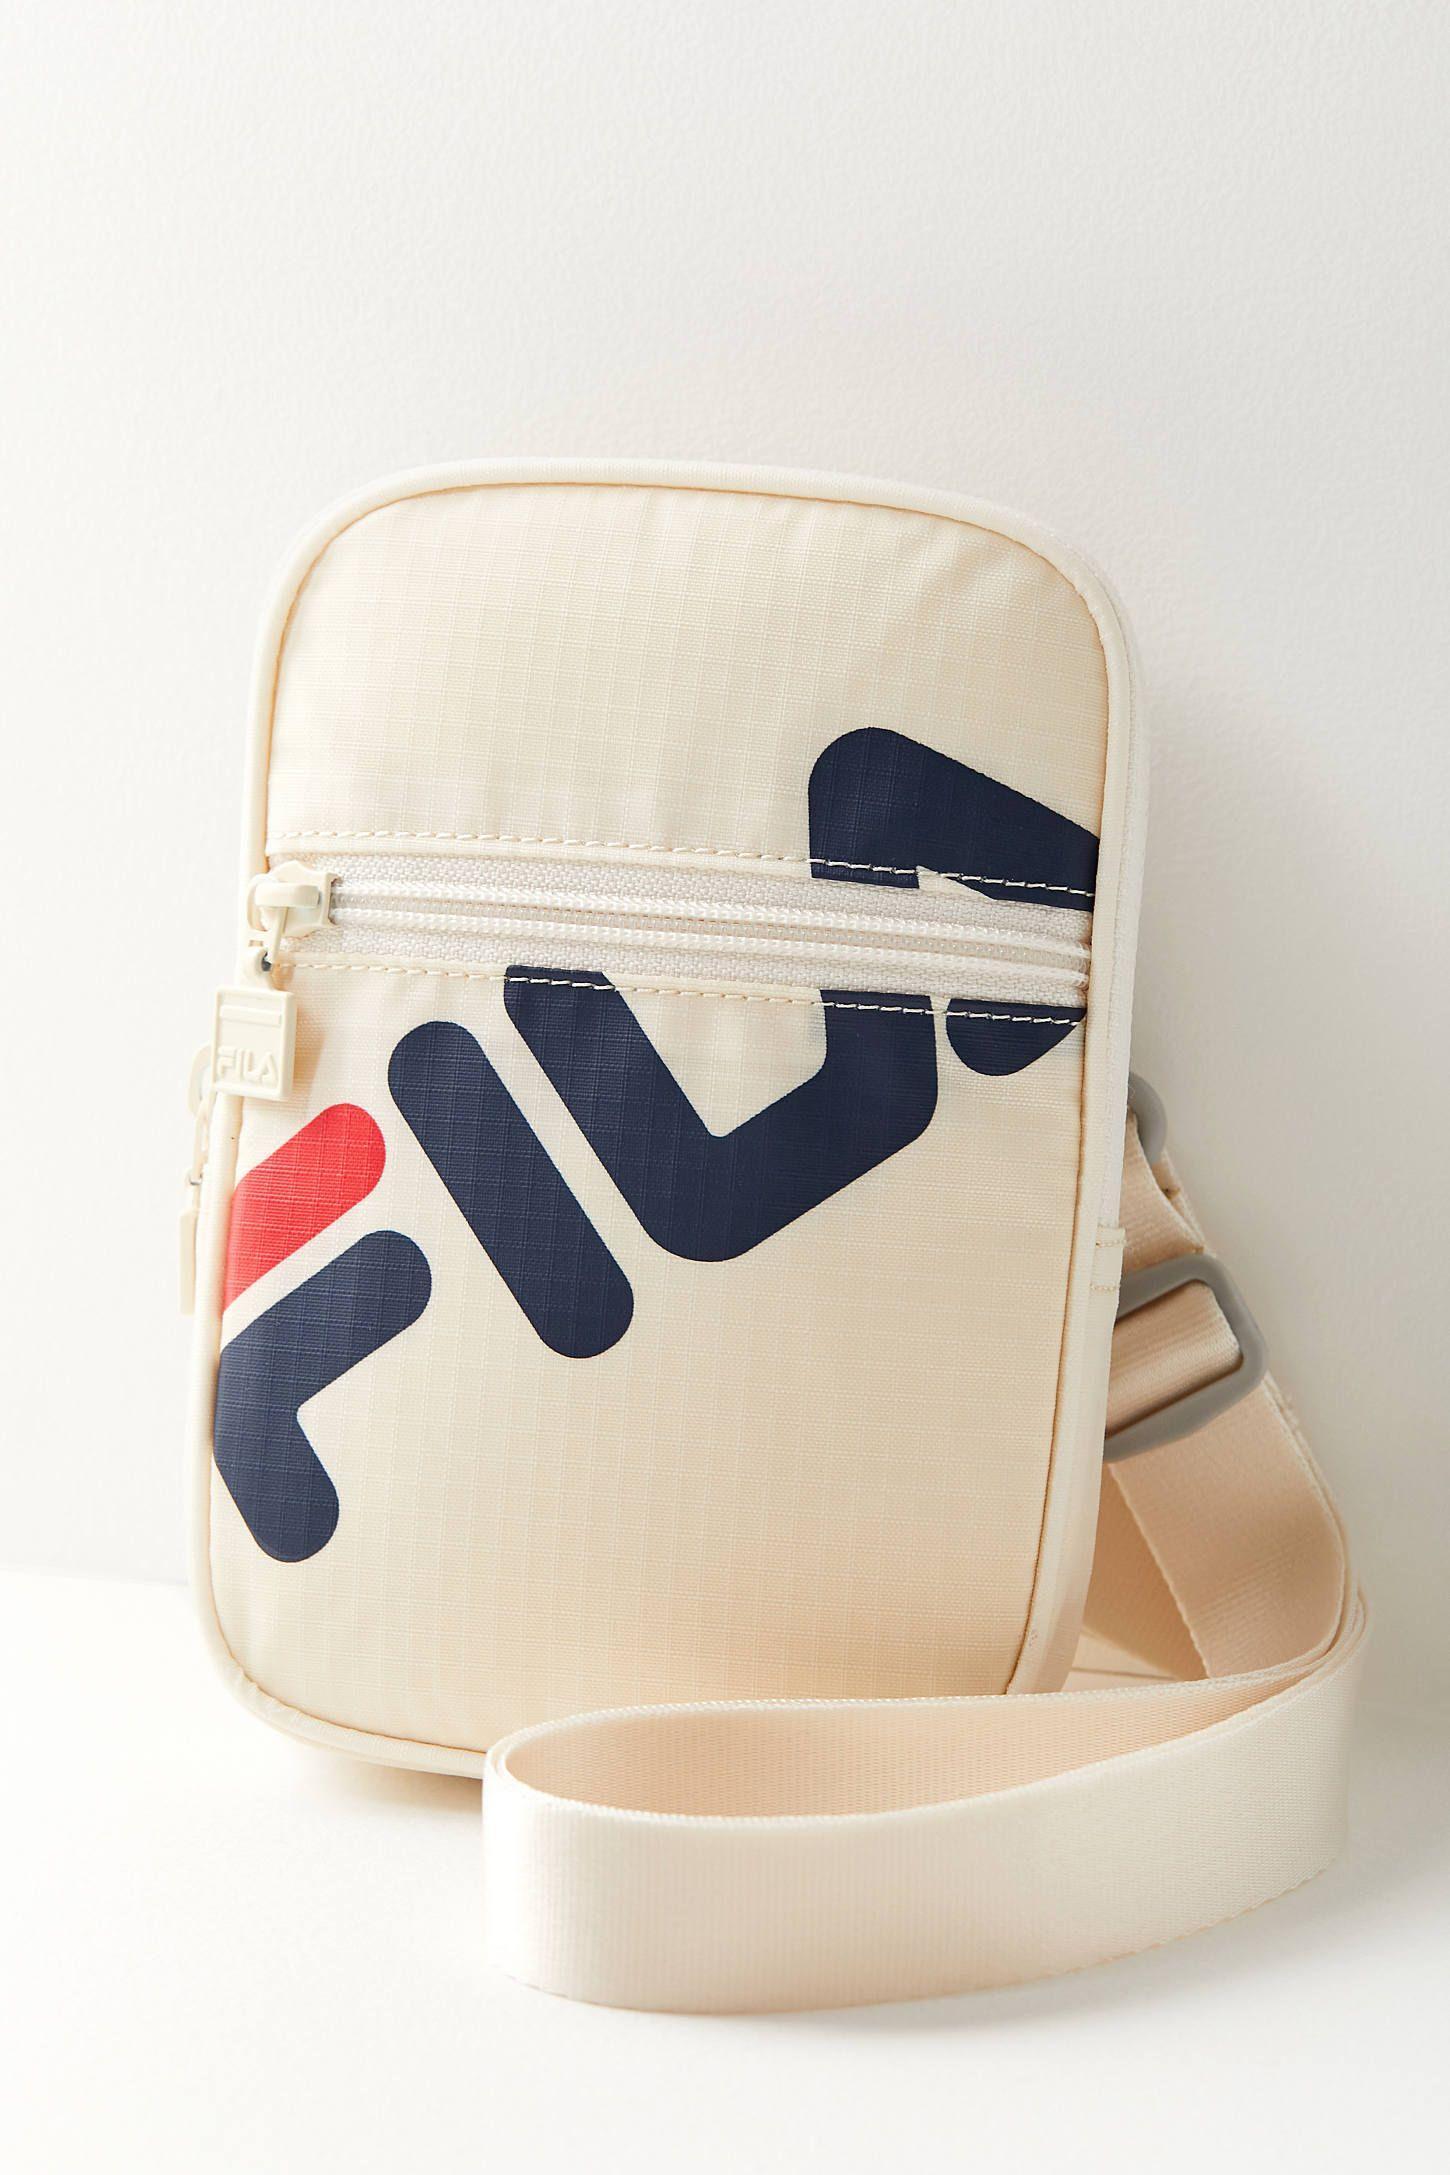 2138cb8d8 FILA UO Exclusive Camera Crossbody Bag in 2019 | gifts | Crossbody ...